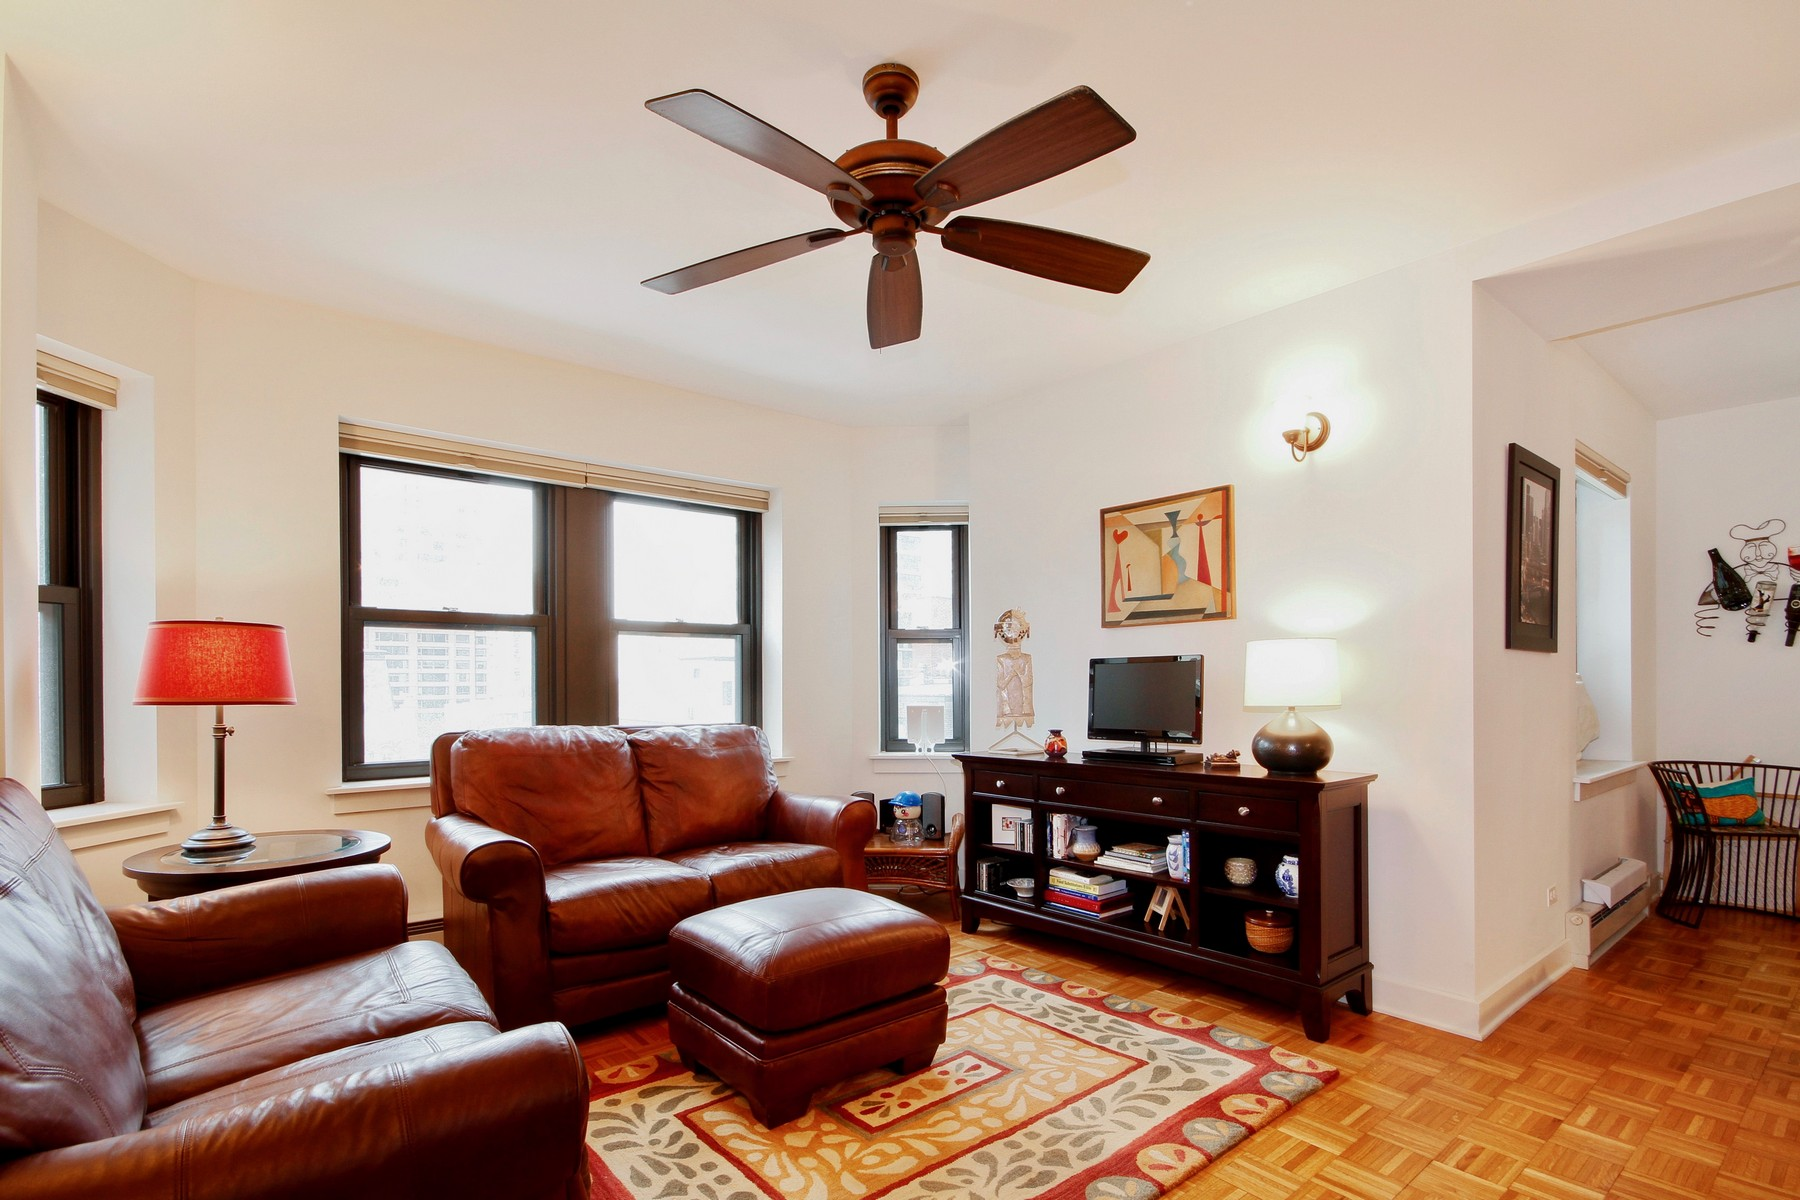 Condomínio para Venda às Gold Coast Apartment 1400 N Lake Shore Drive Unit 8O Near North Side, Chicago, Illinois, 60610 Estados Unidos